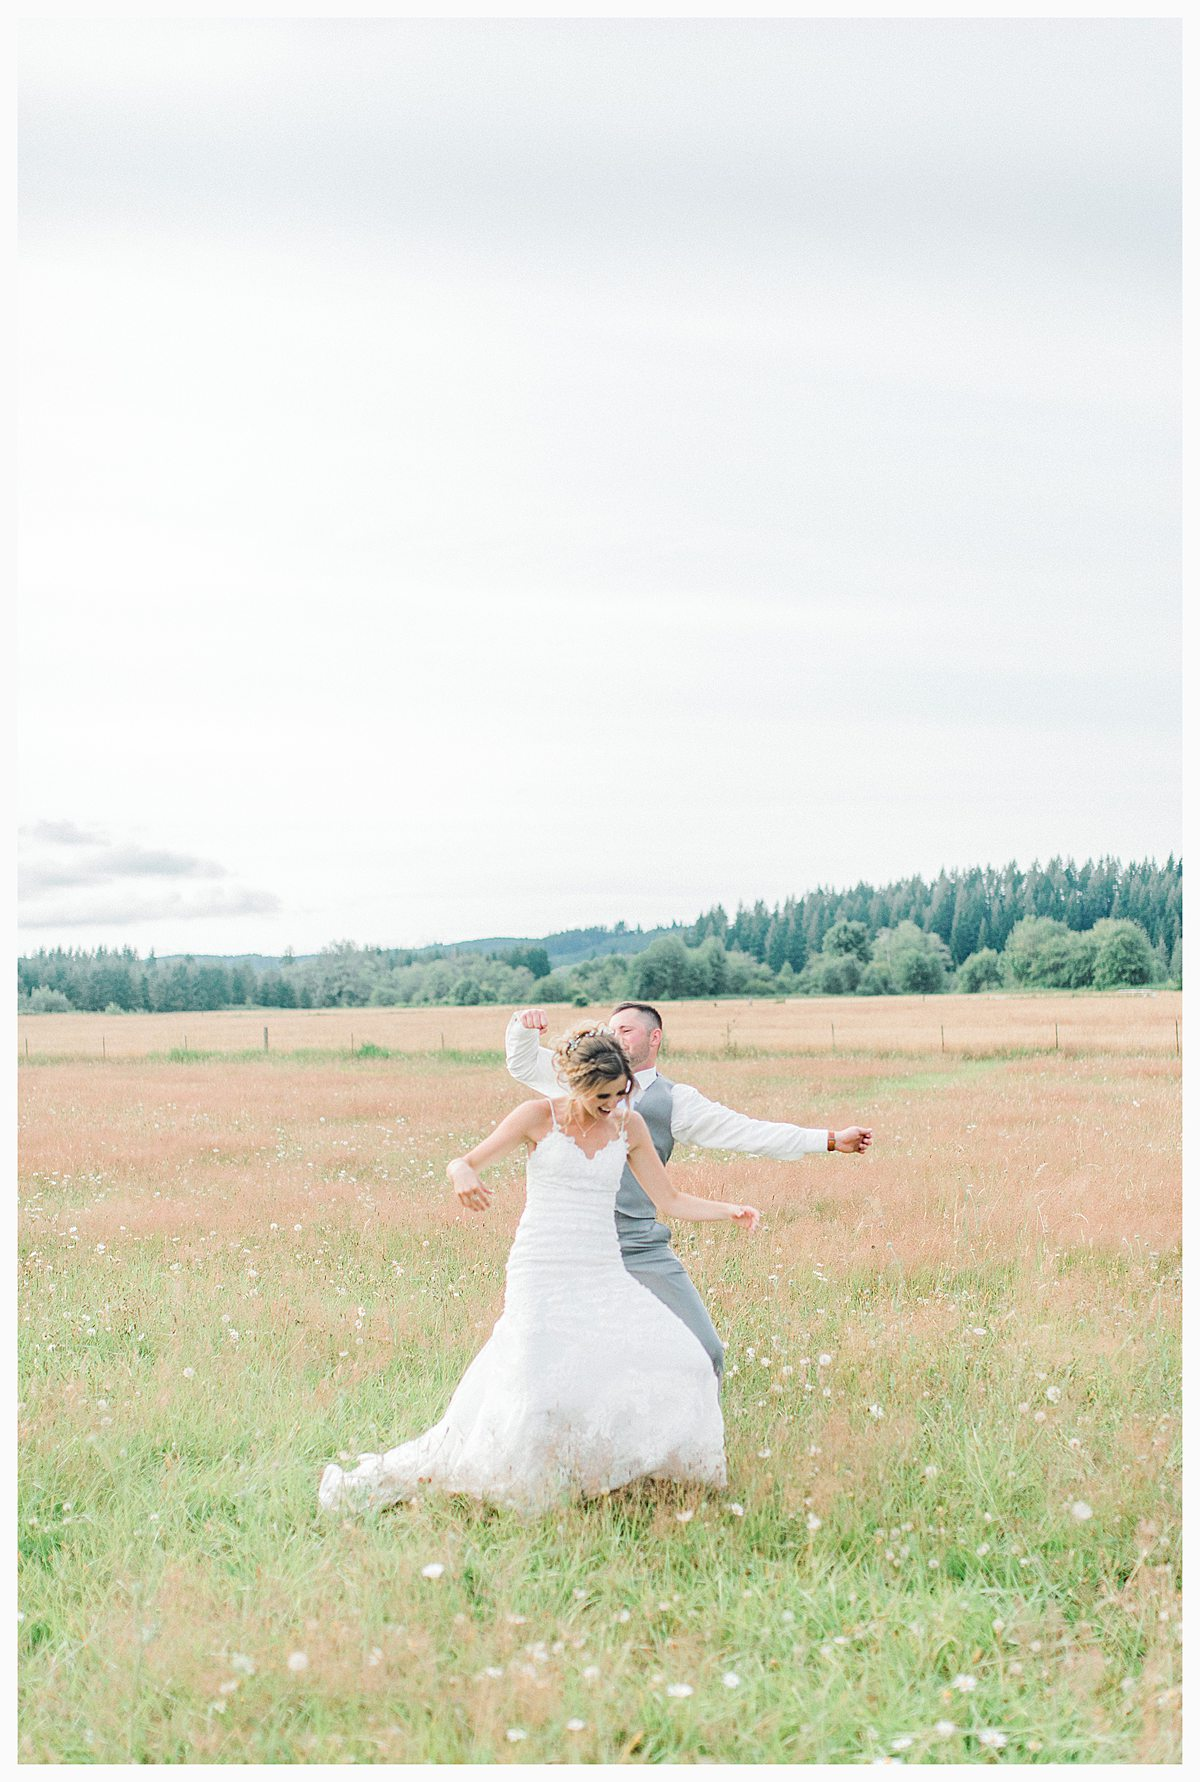 Rustic Coastal Blue Wedding in Southwest Washington, Emma Rose Company, Seattle and Portland Wedding Photographer, Light and Airy_0130.jpg